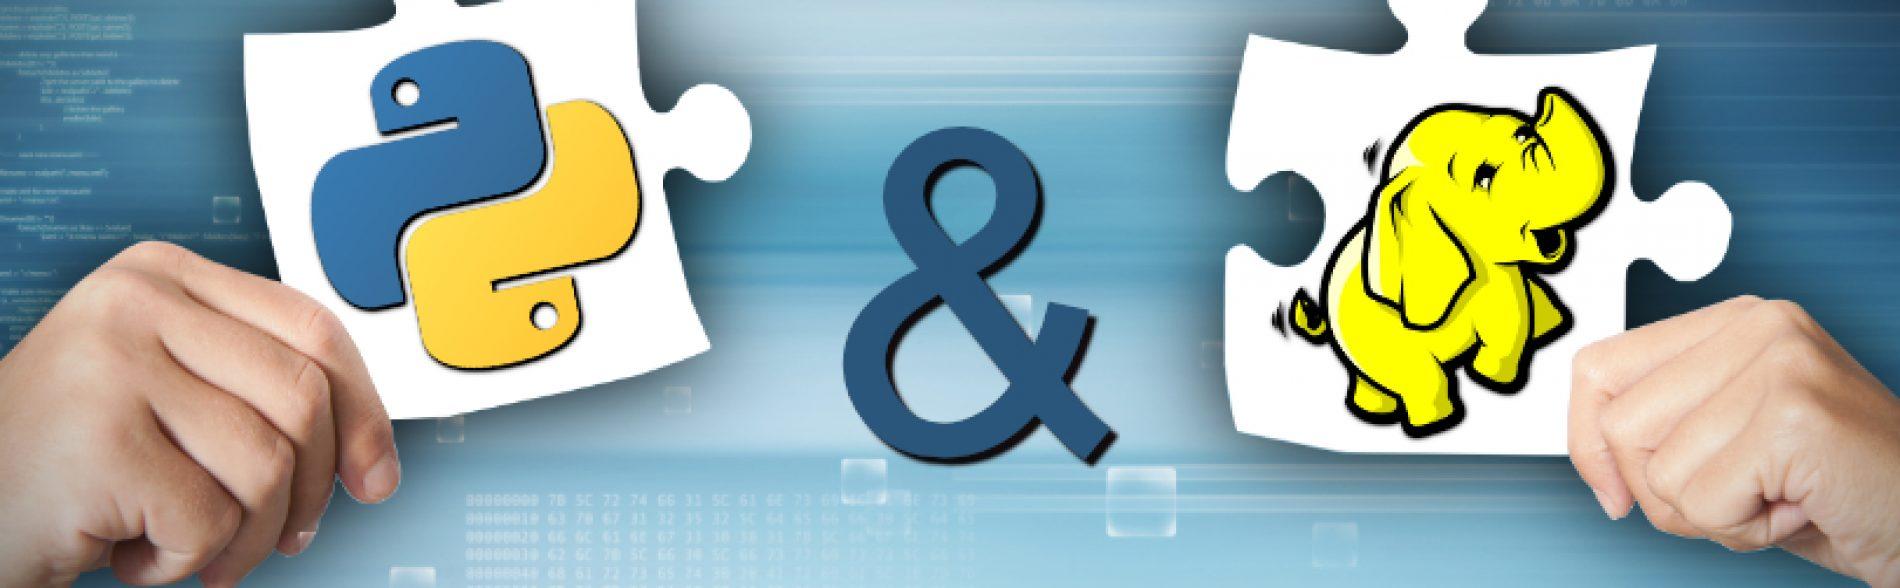 Lançamento do curso -Python and Hadoop for Data Engineering